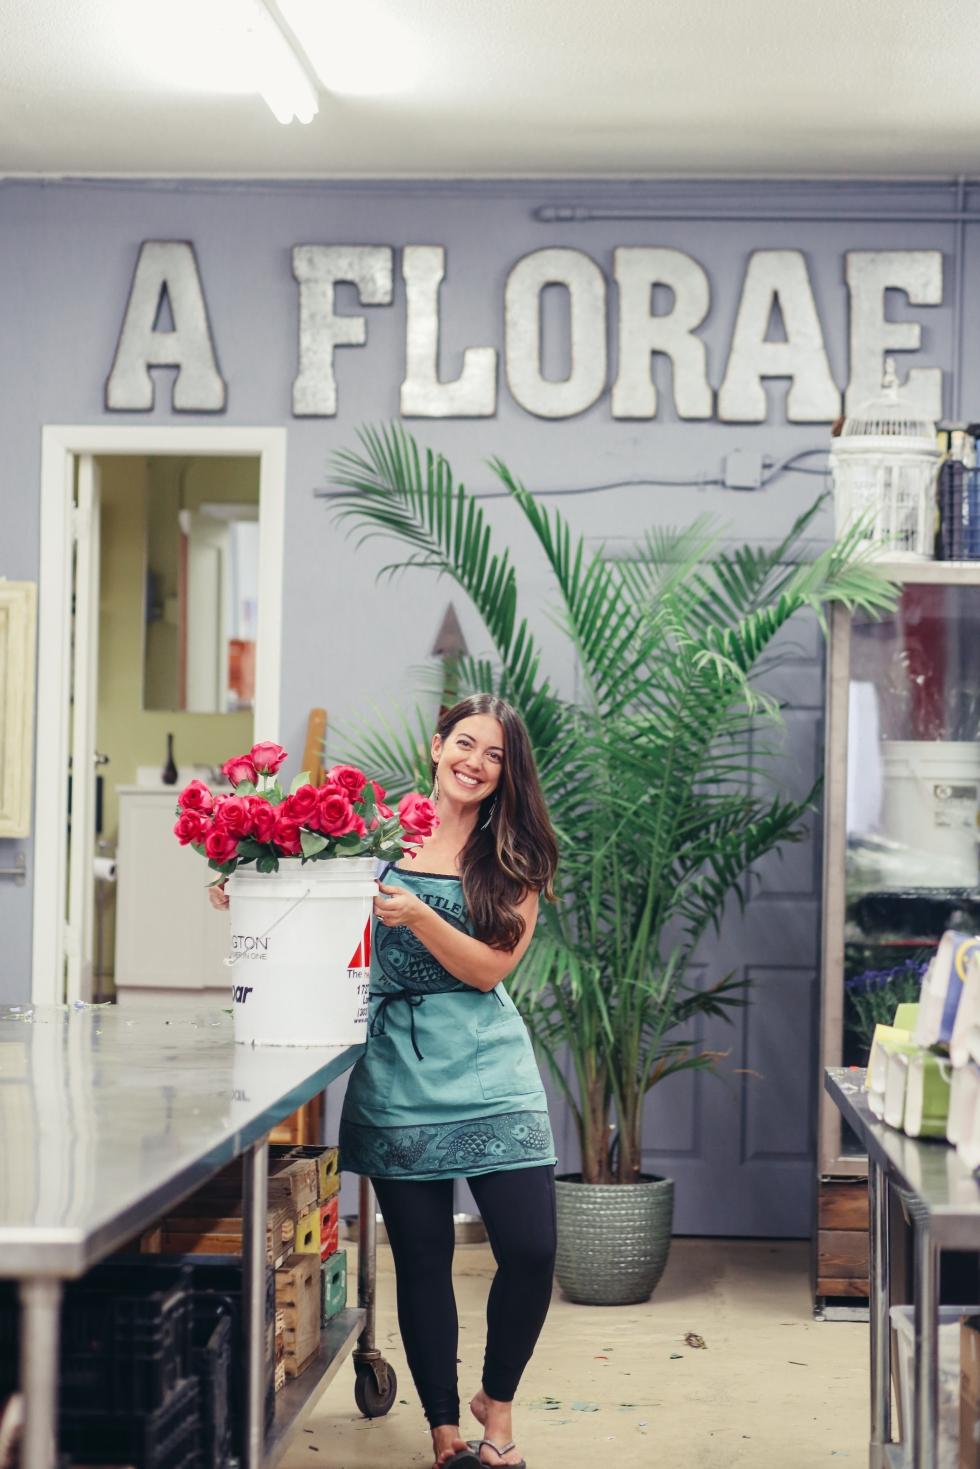 A_Florae-164